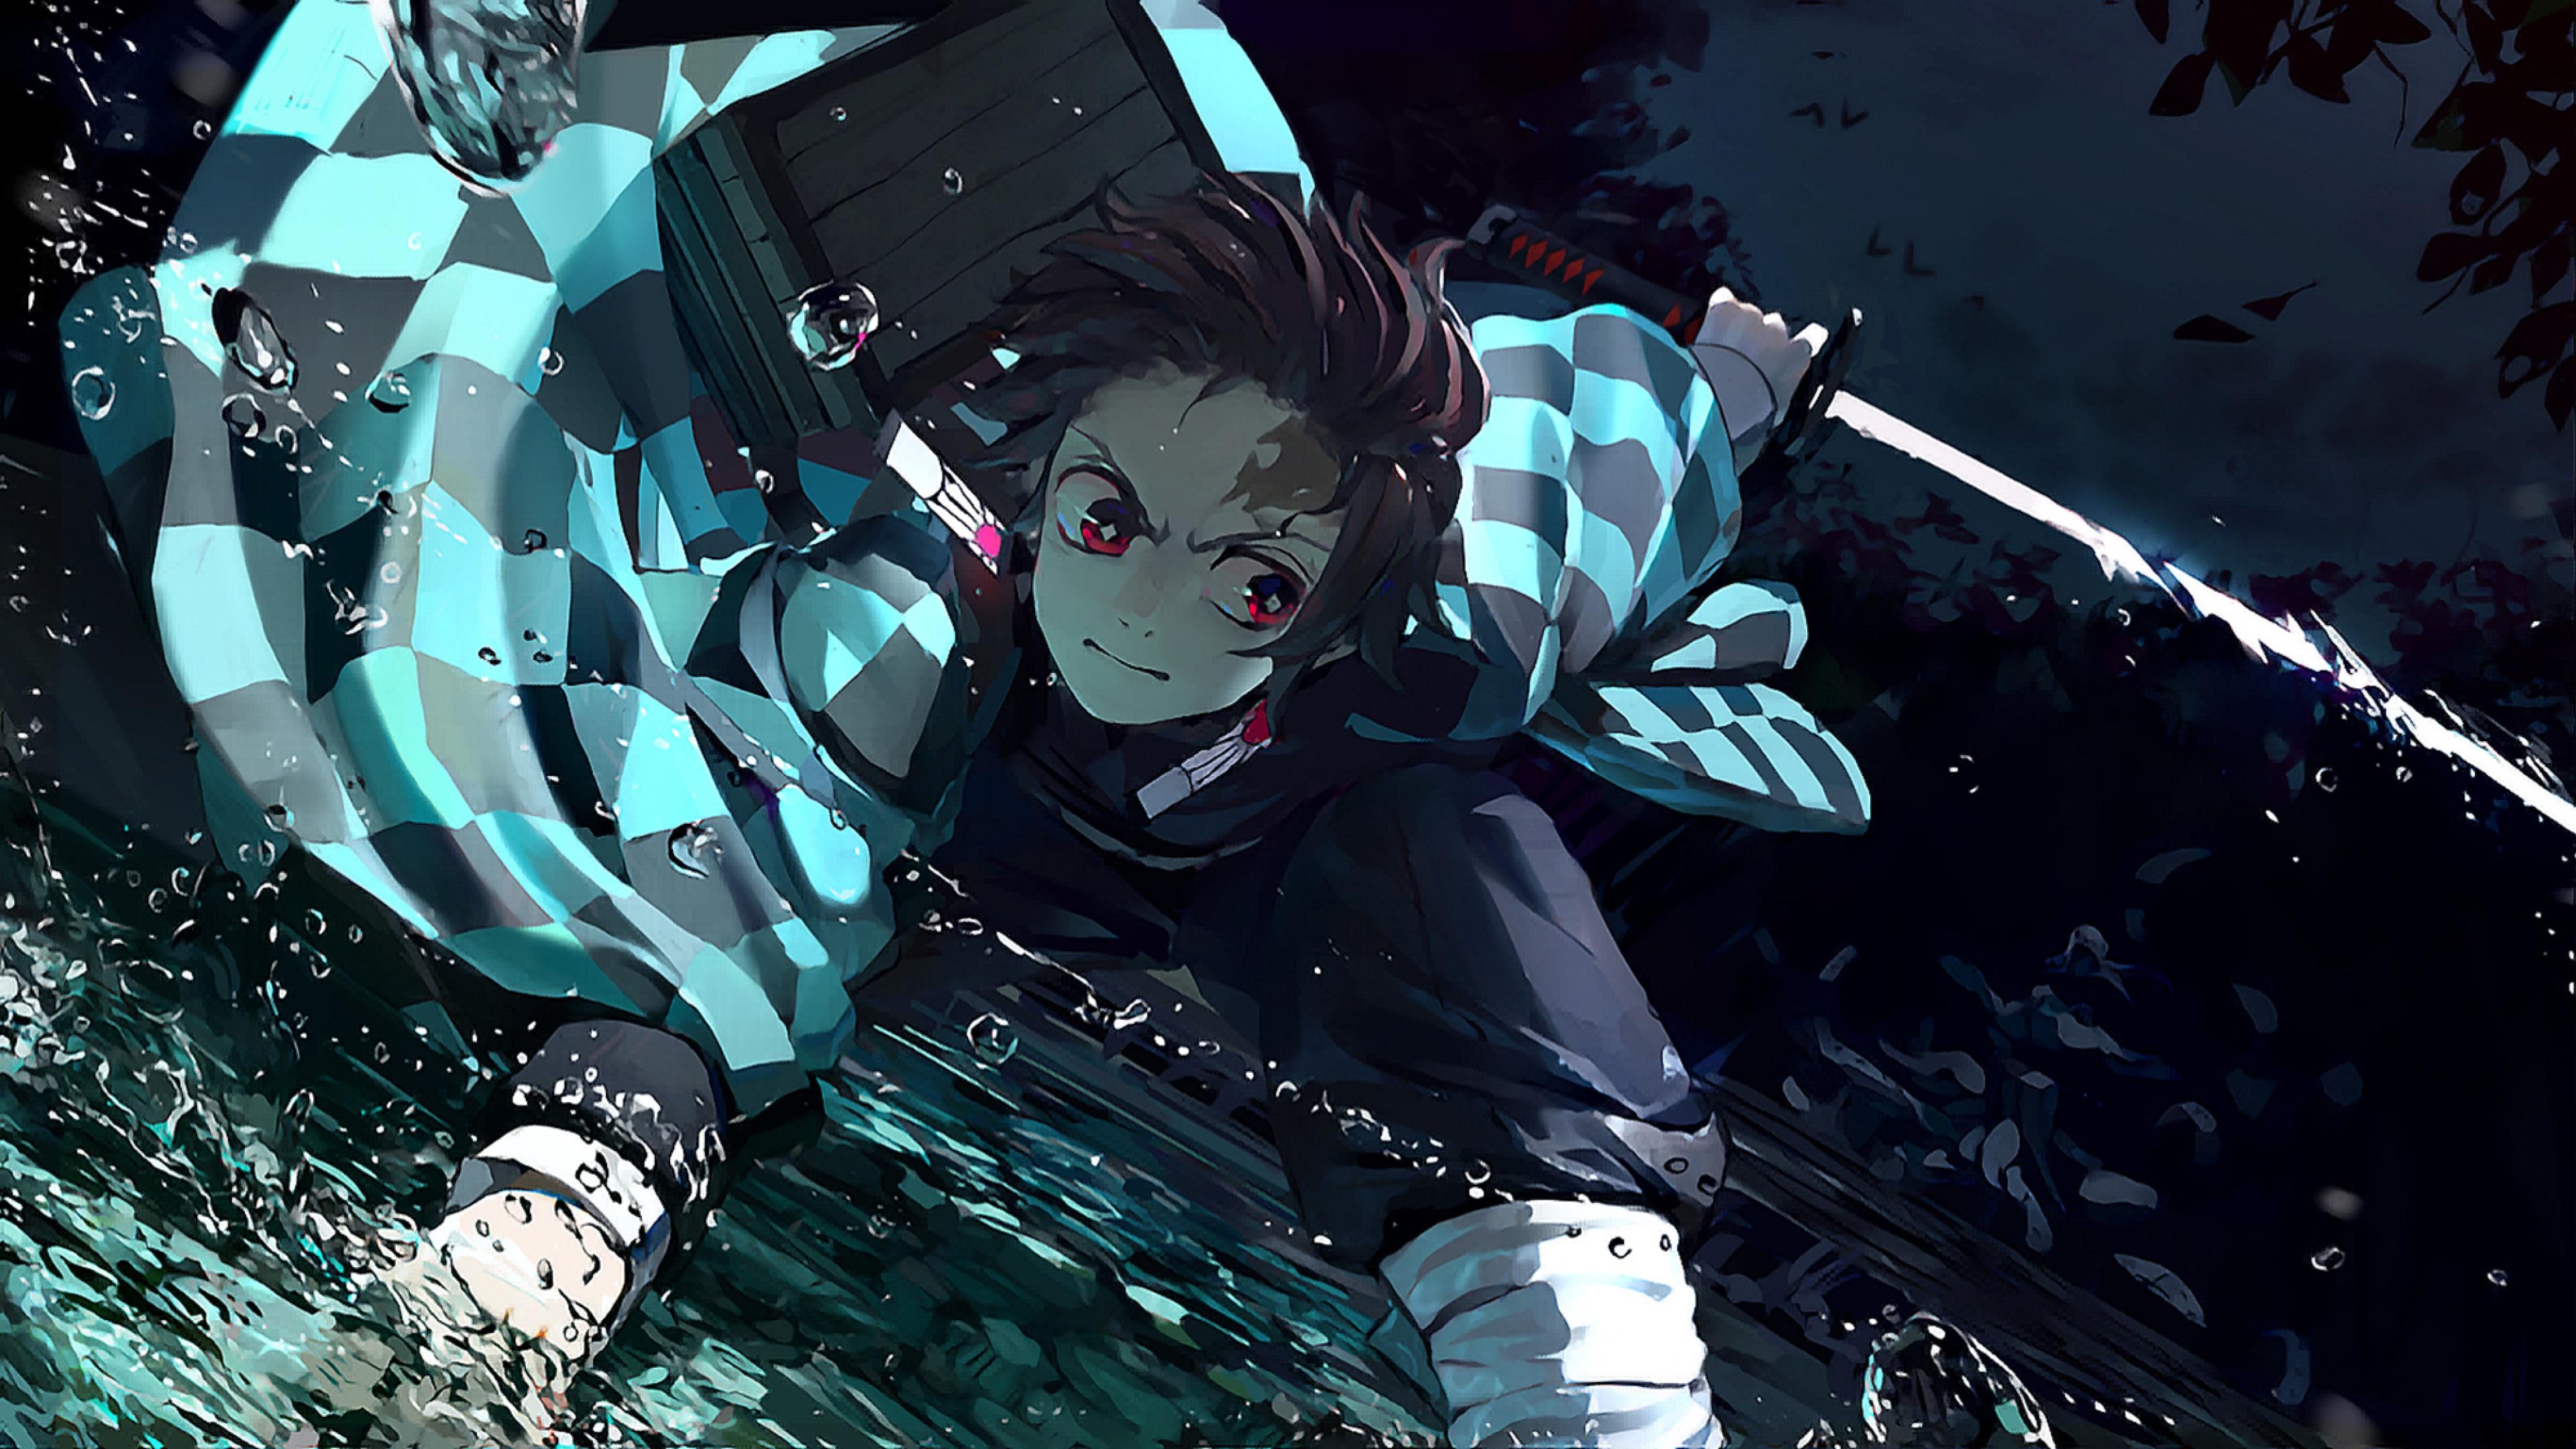 3840x2160 Demon Slayer Tanjirou Kamado 4K Wallpaper, HD ...